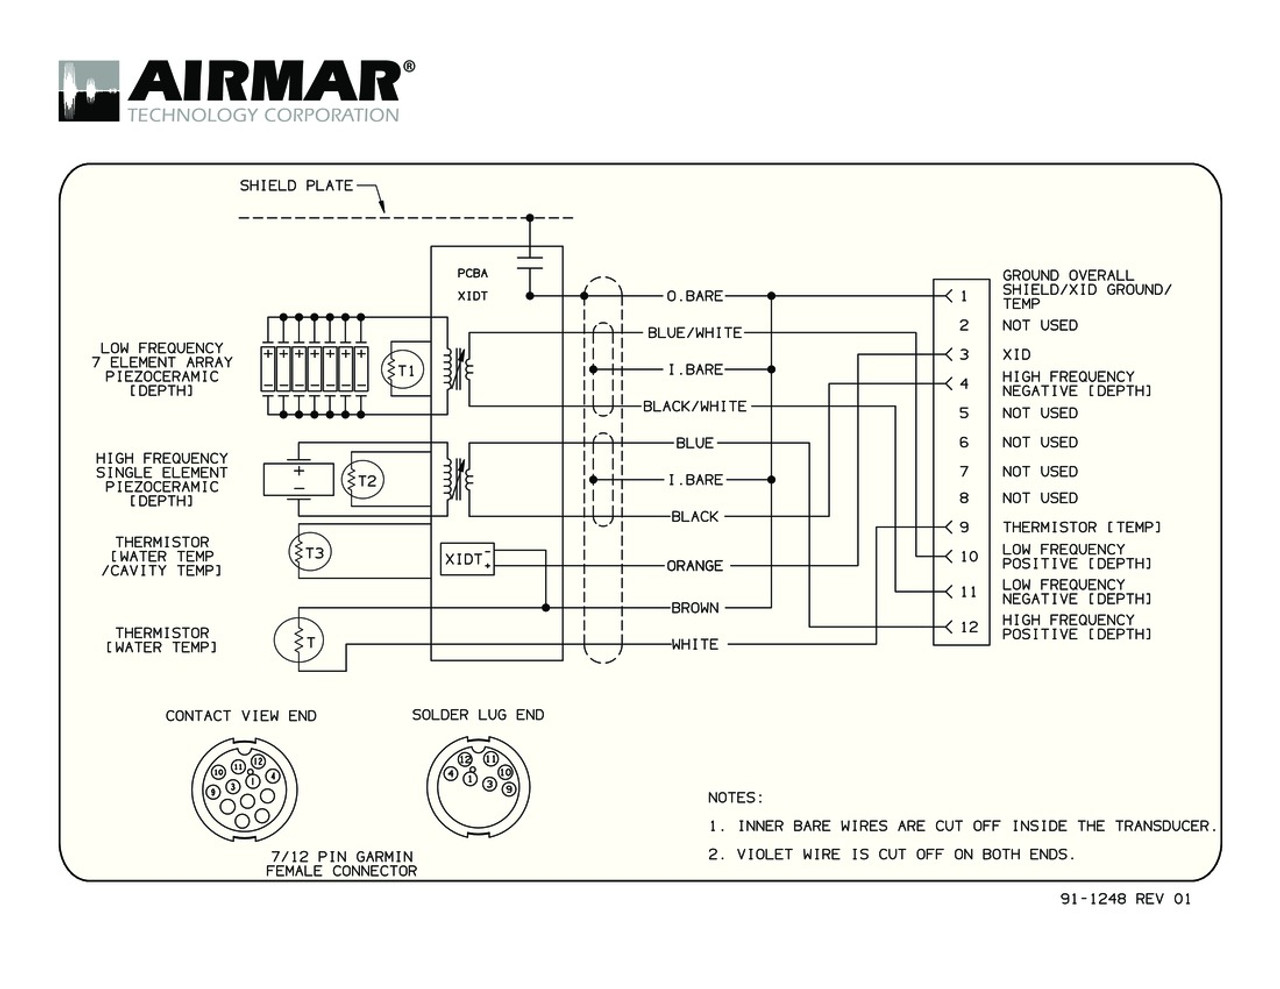 raymarine transducer wiring diagram [ 1100 x 850 Pixel ]